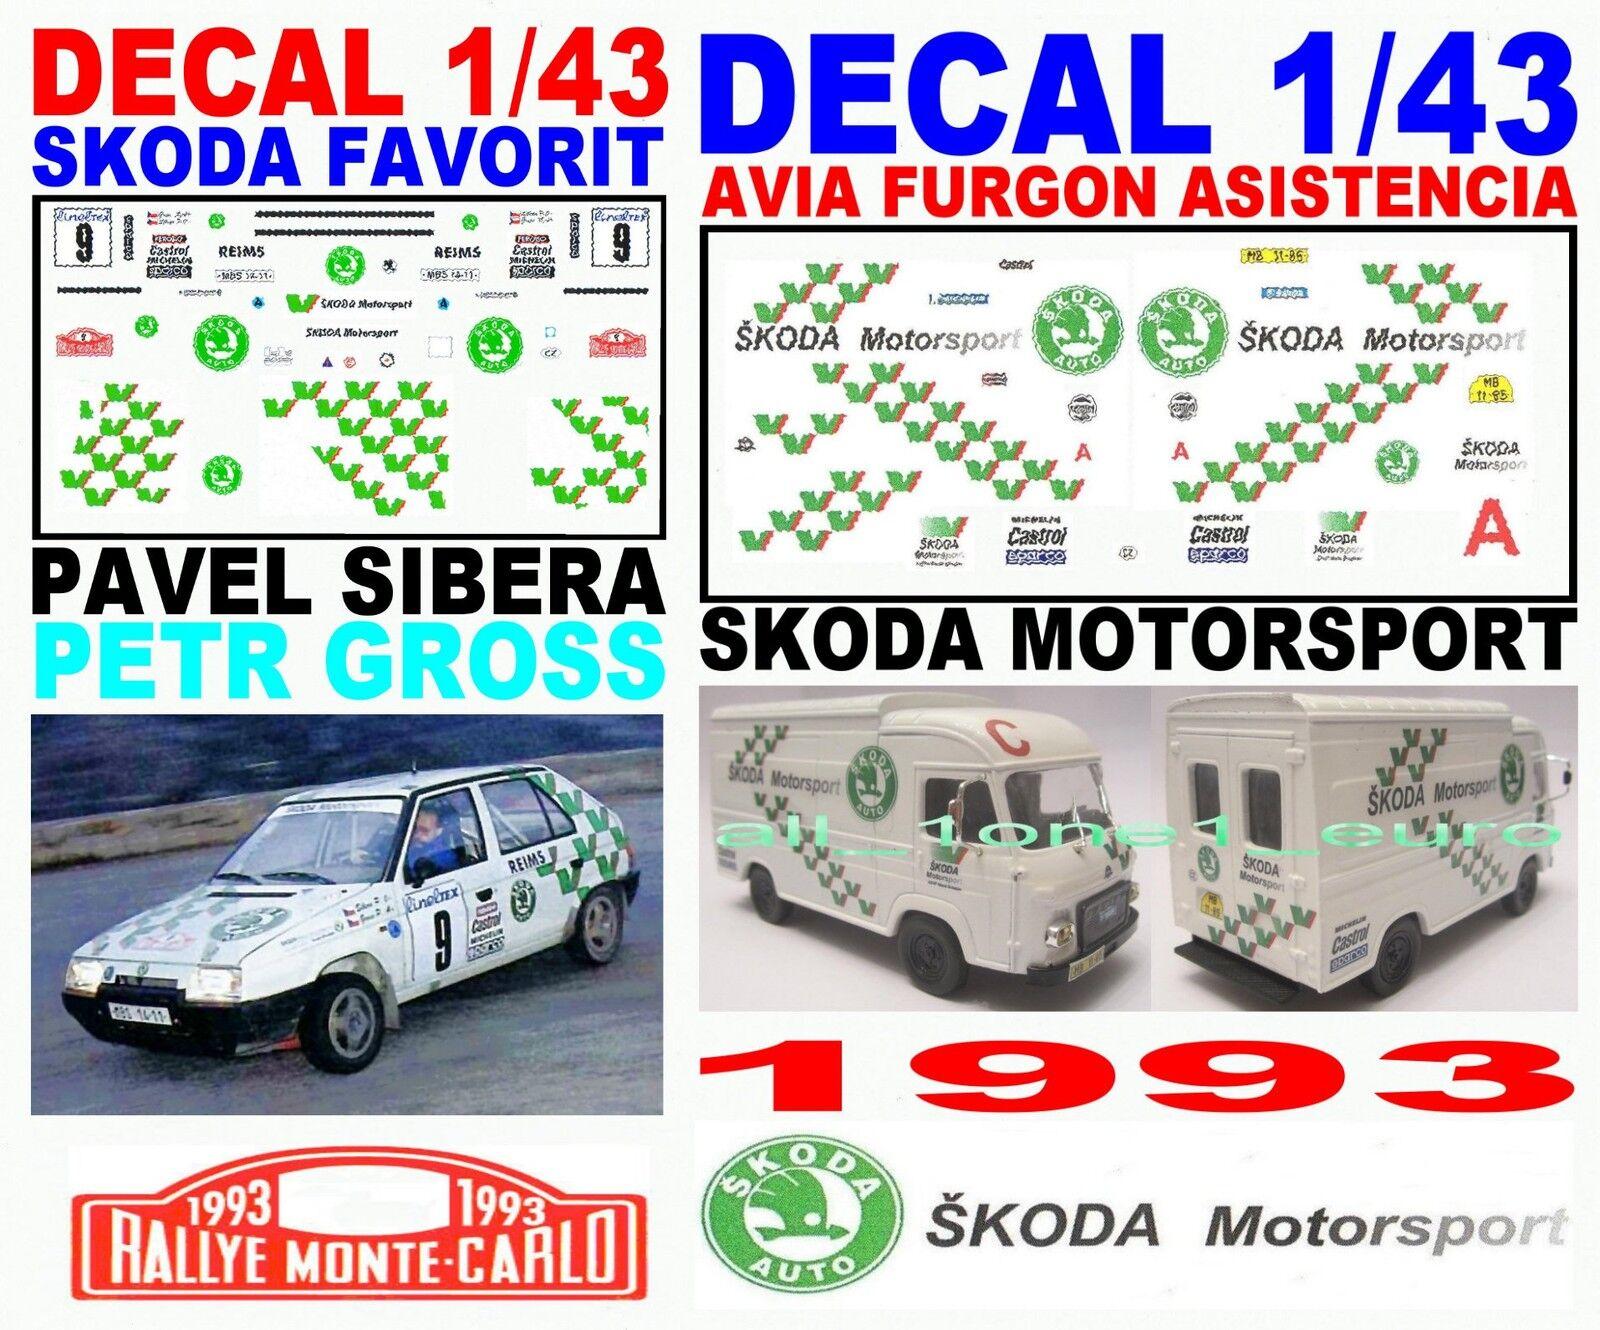 DECAL 1 43 SET SKODA MOTORSPORT 1993 (02) (02) (02) 92d711